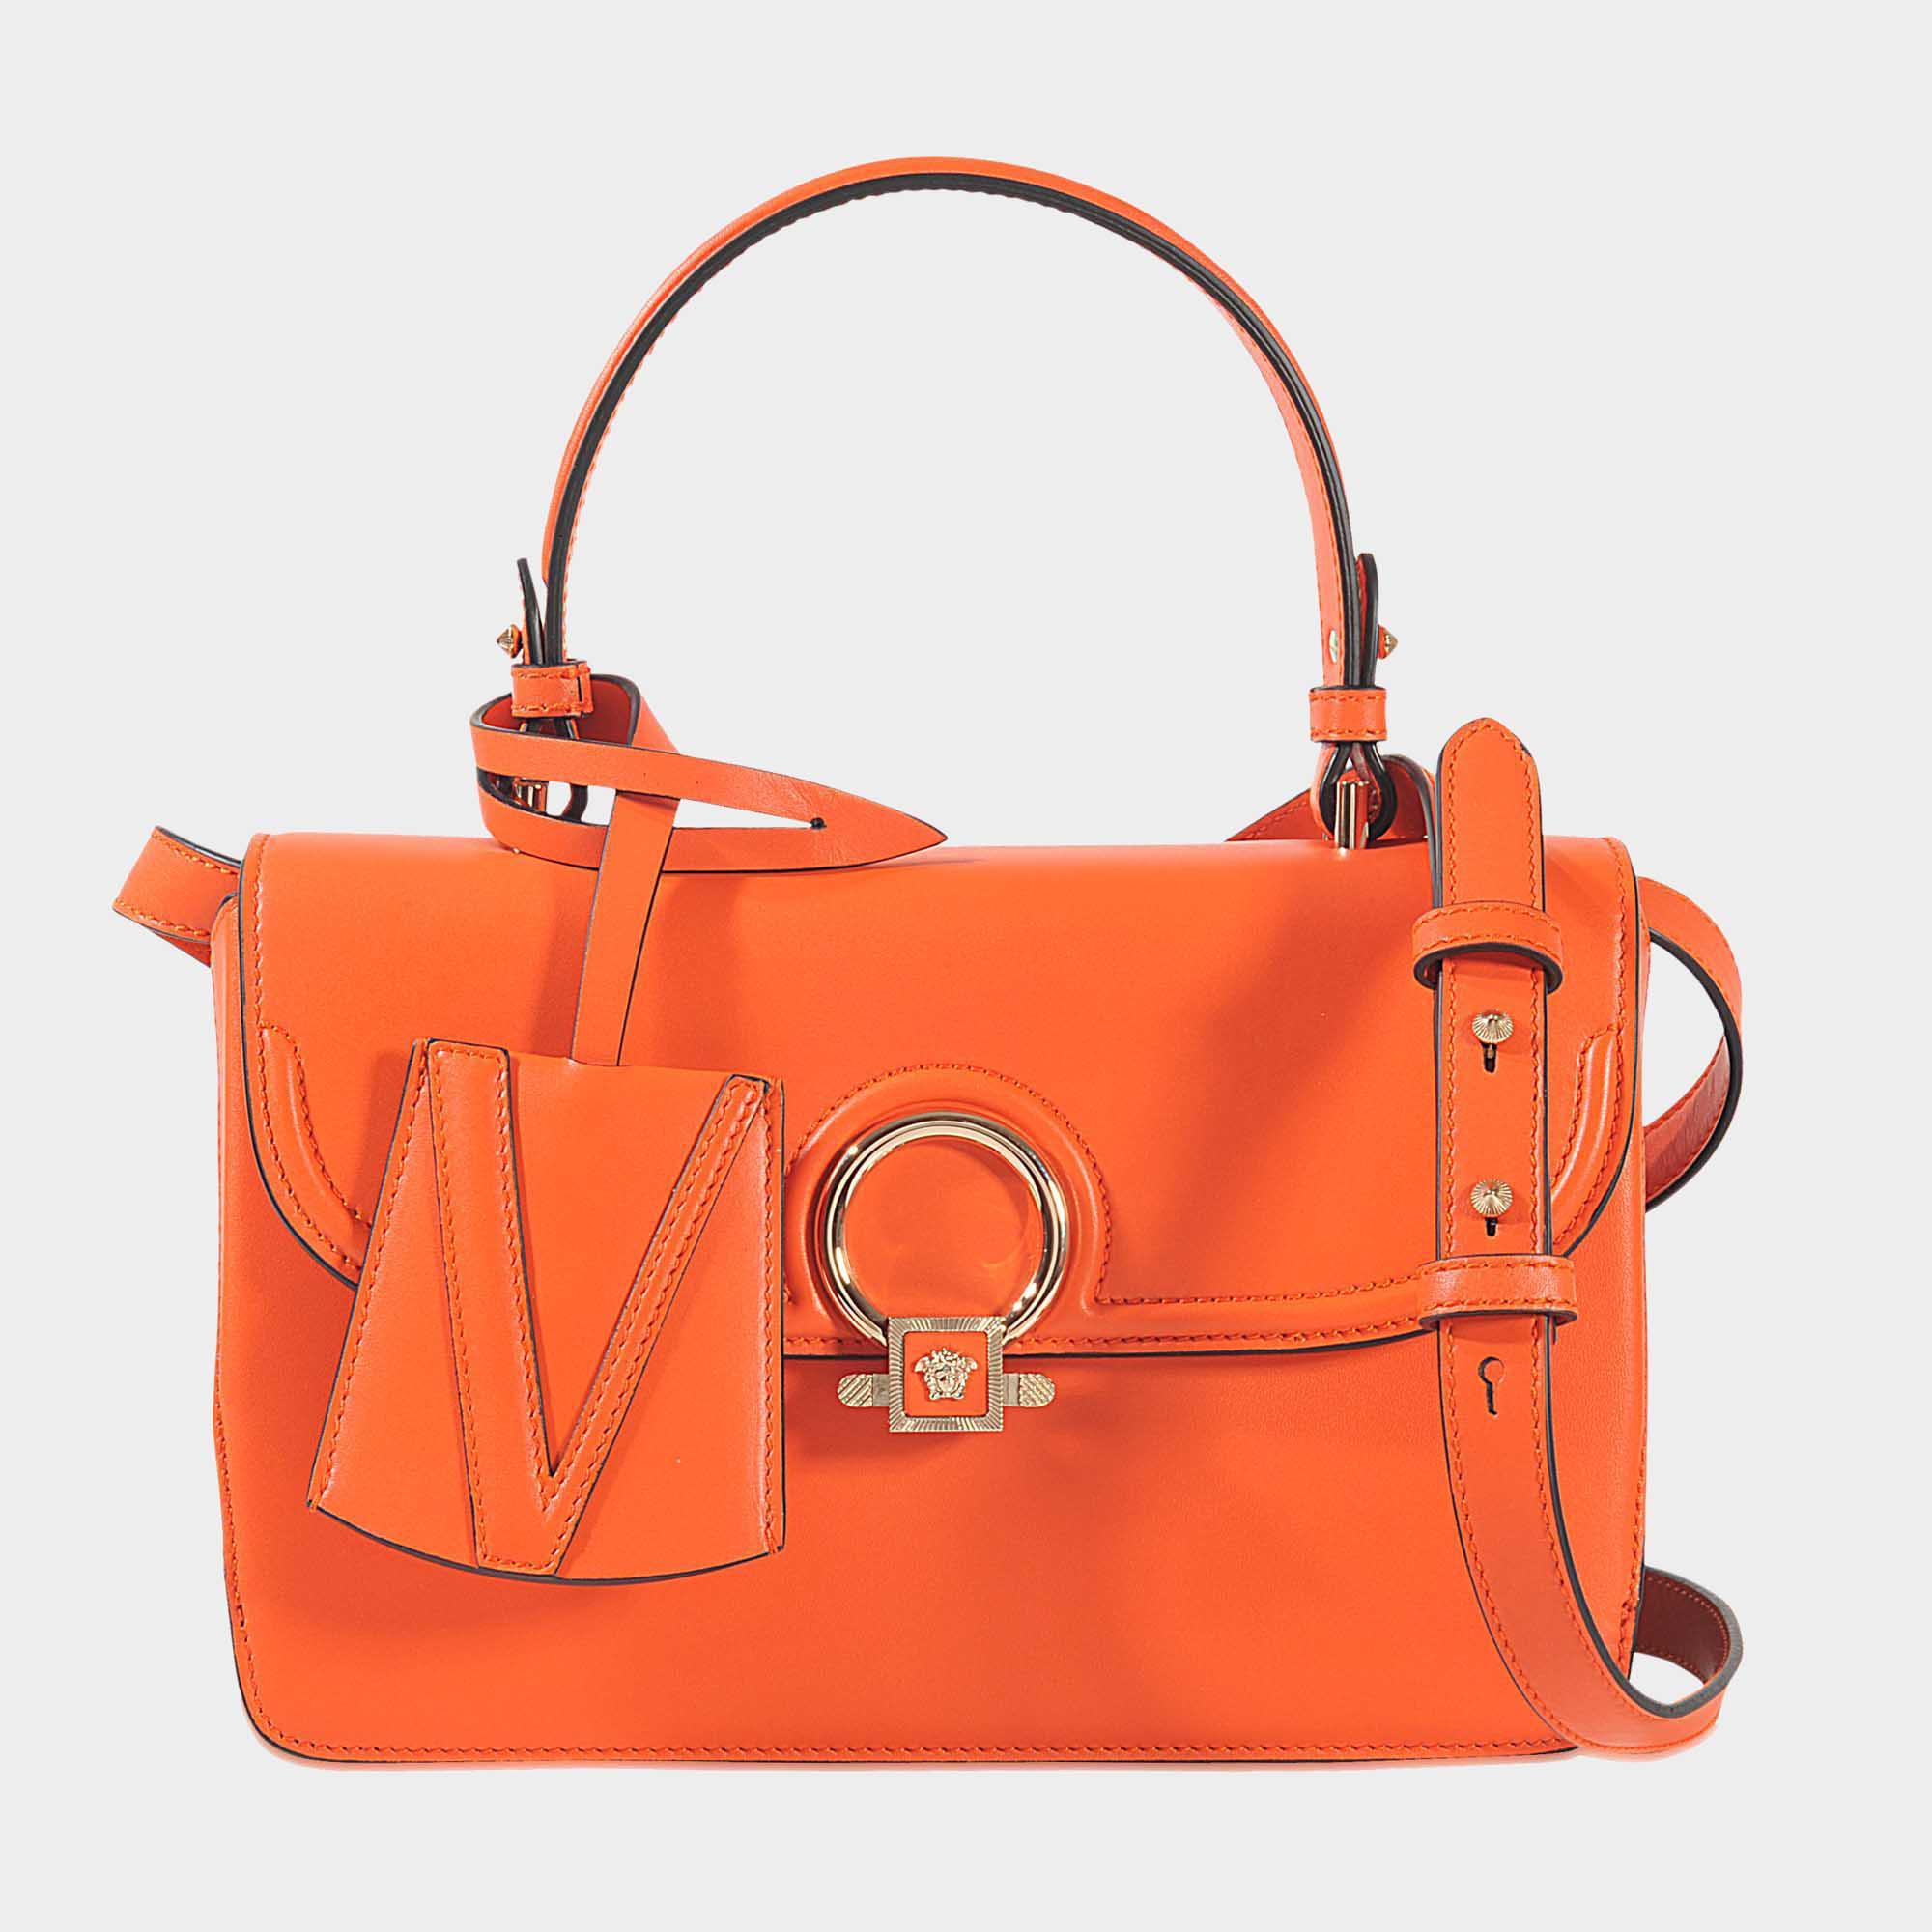 Versace Petit sac à main the DV1 kTJAQNt0